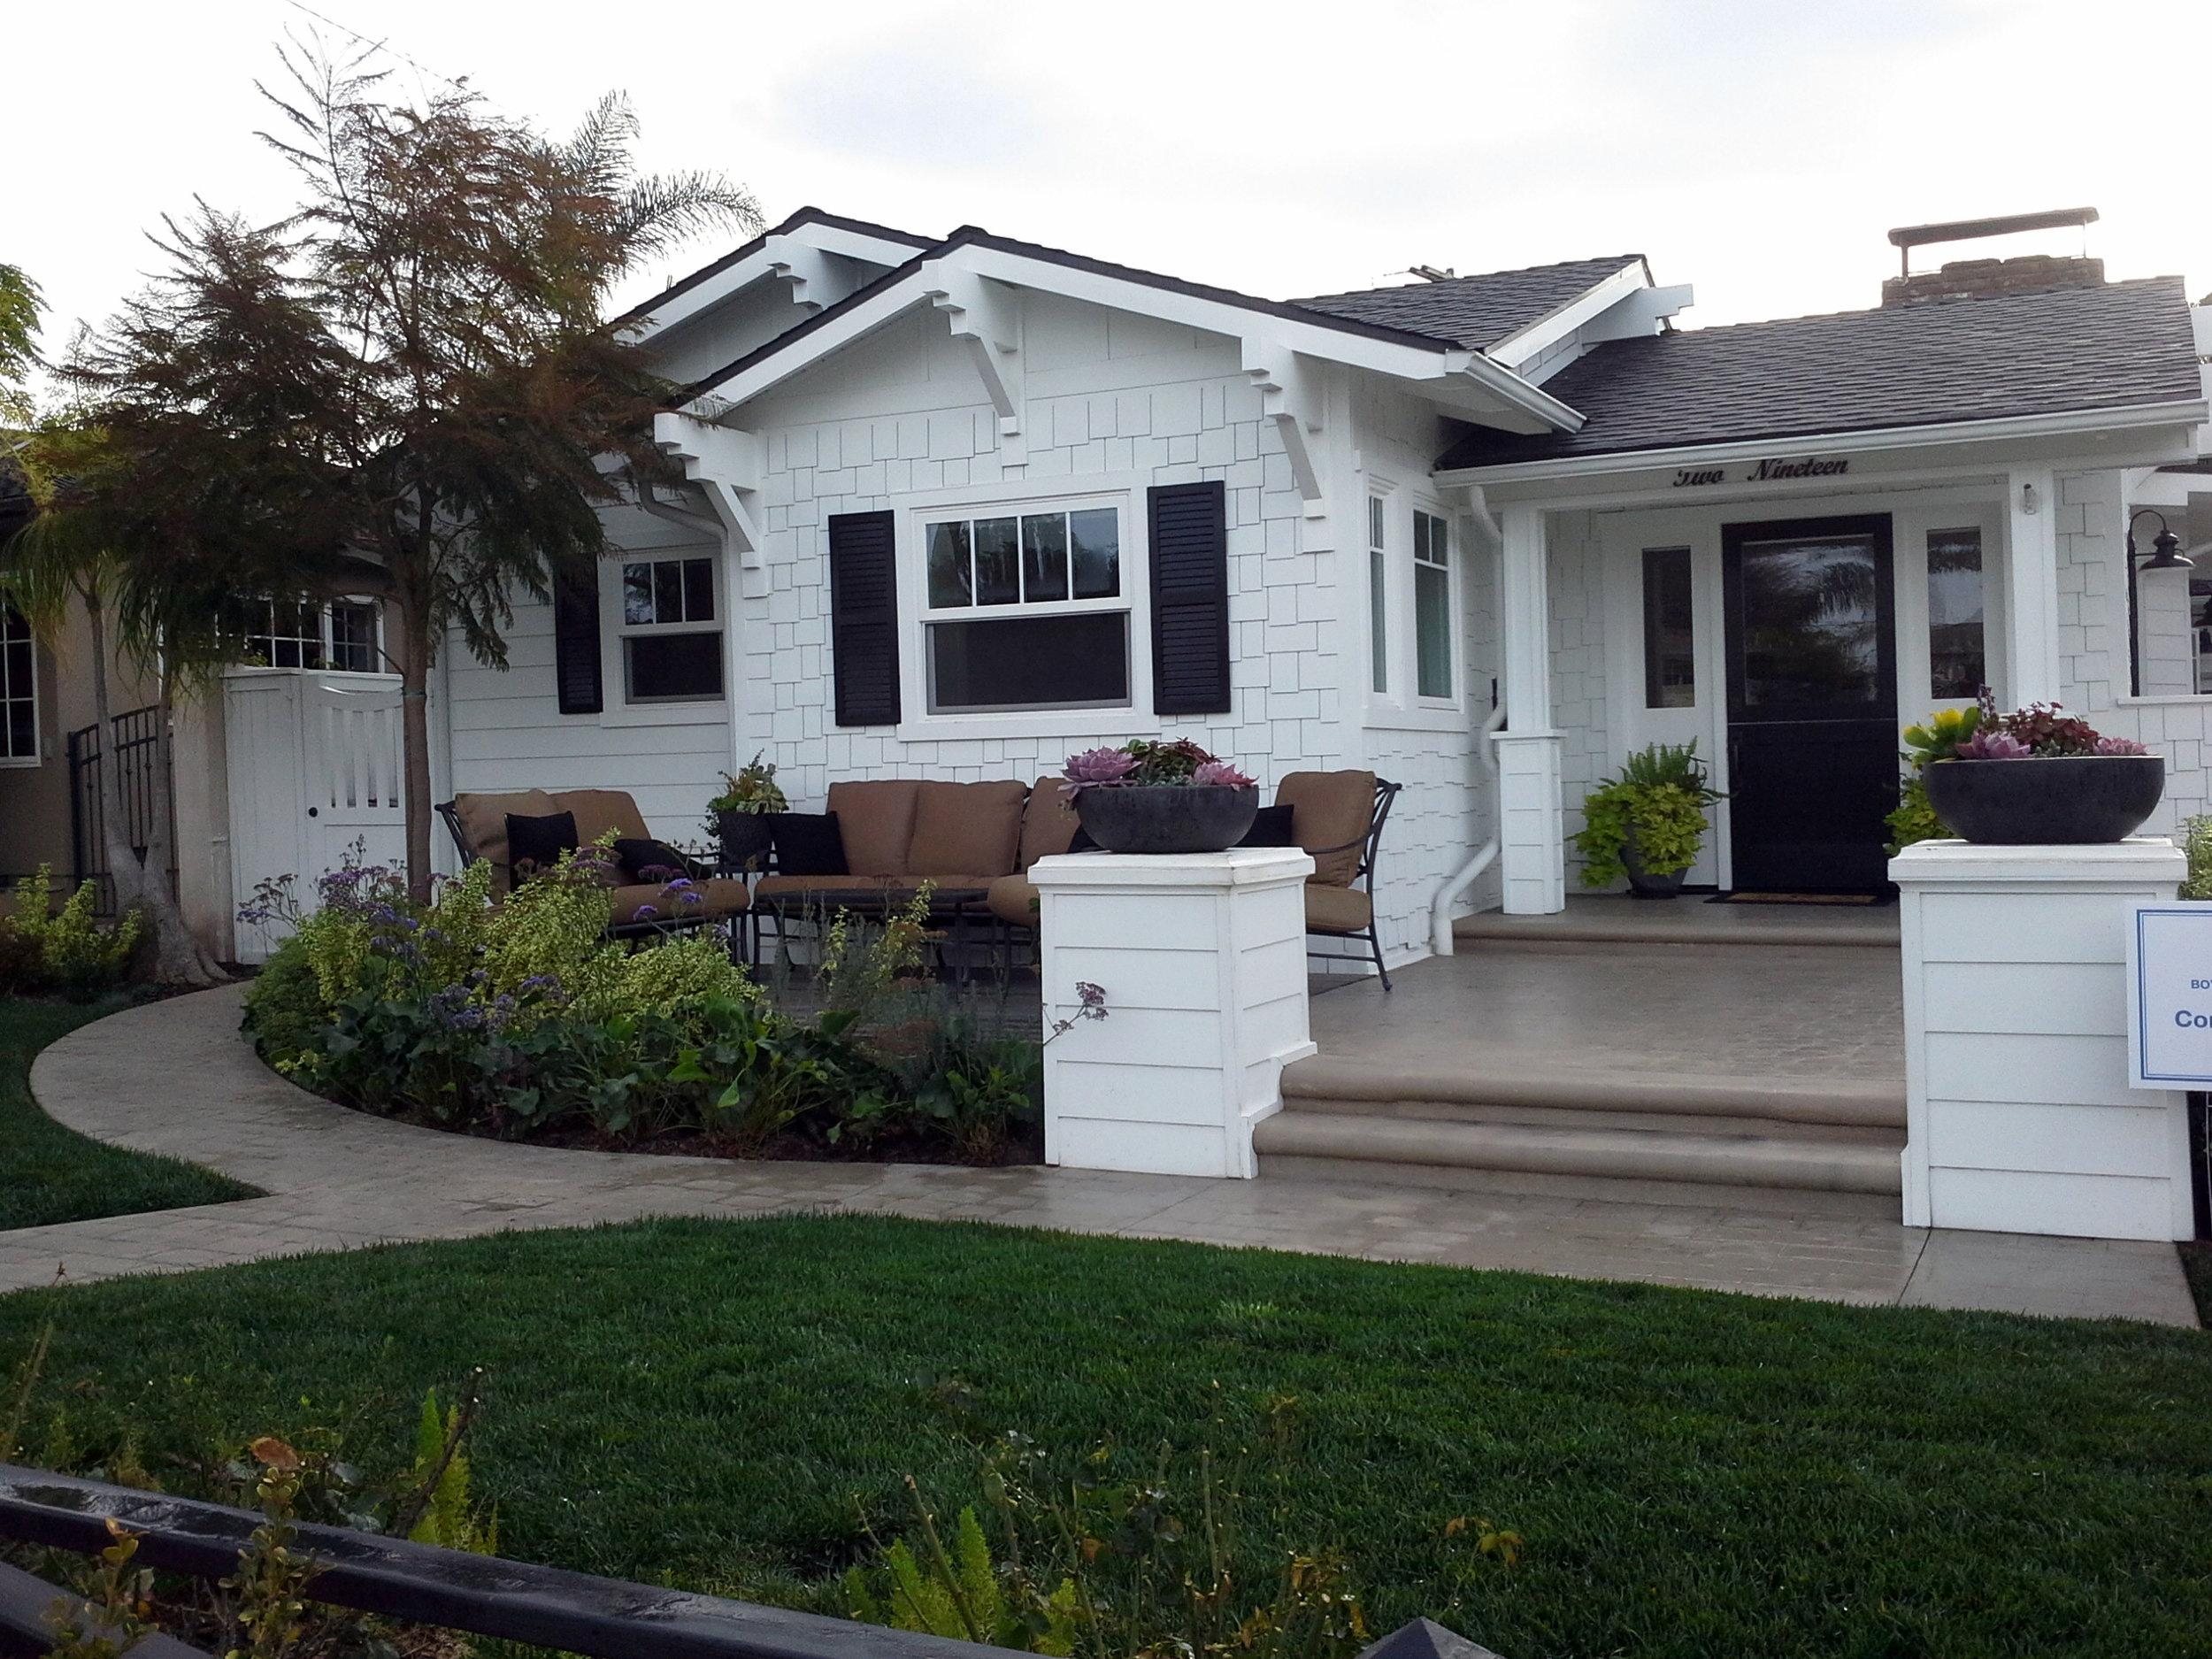 BLACK AND WHITE HOUSE GARDEN DESIGN